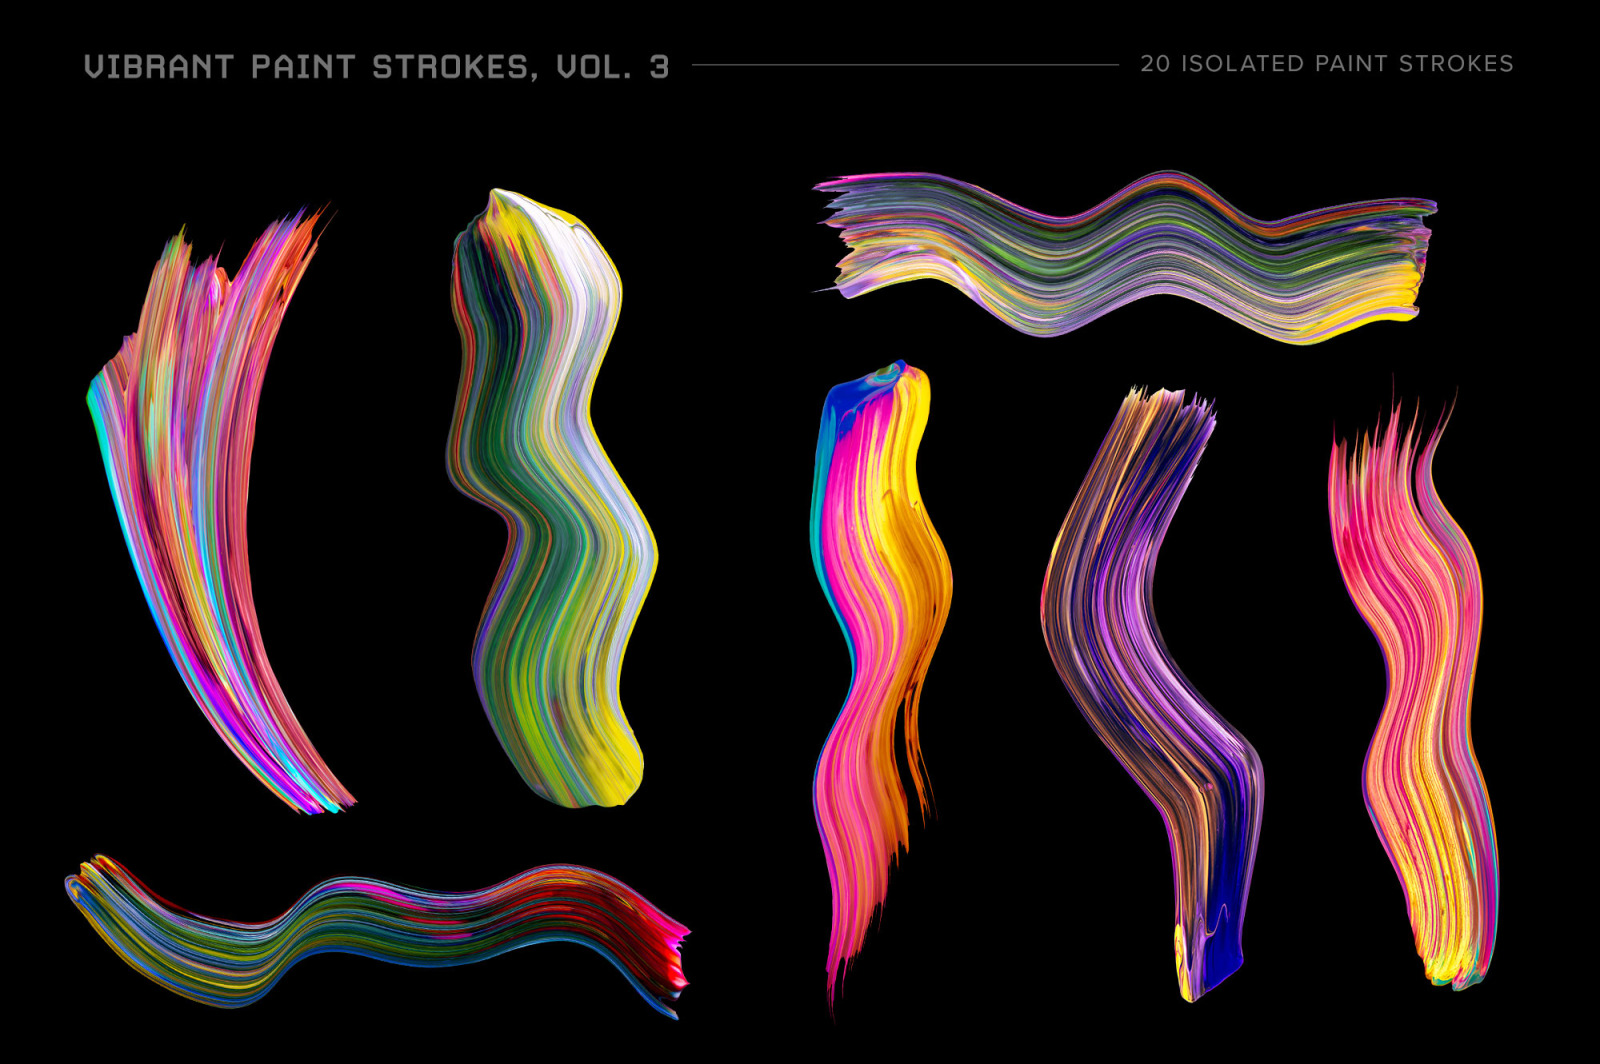 Vibrant Paint Strokes, Vol. 3